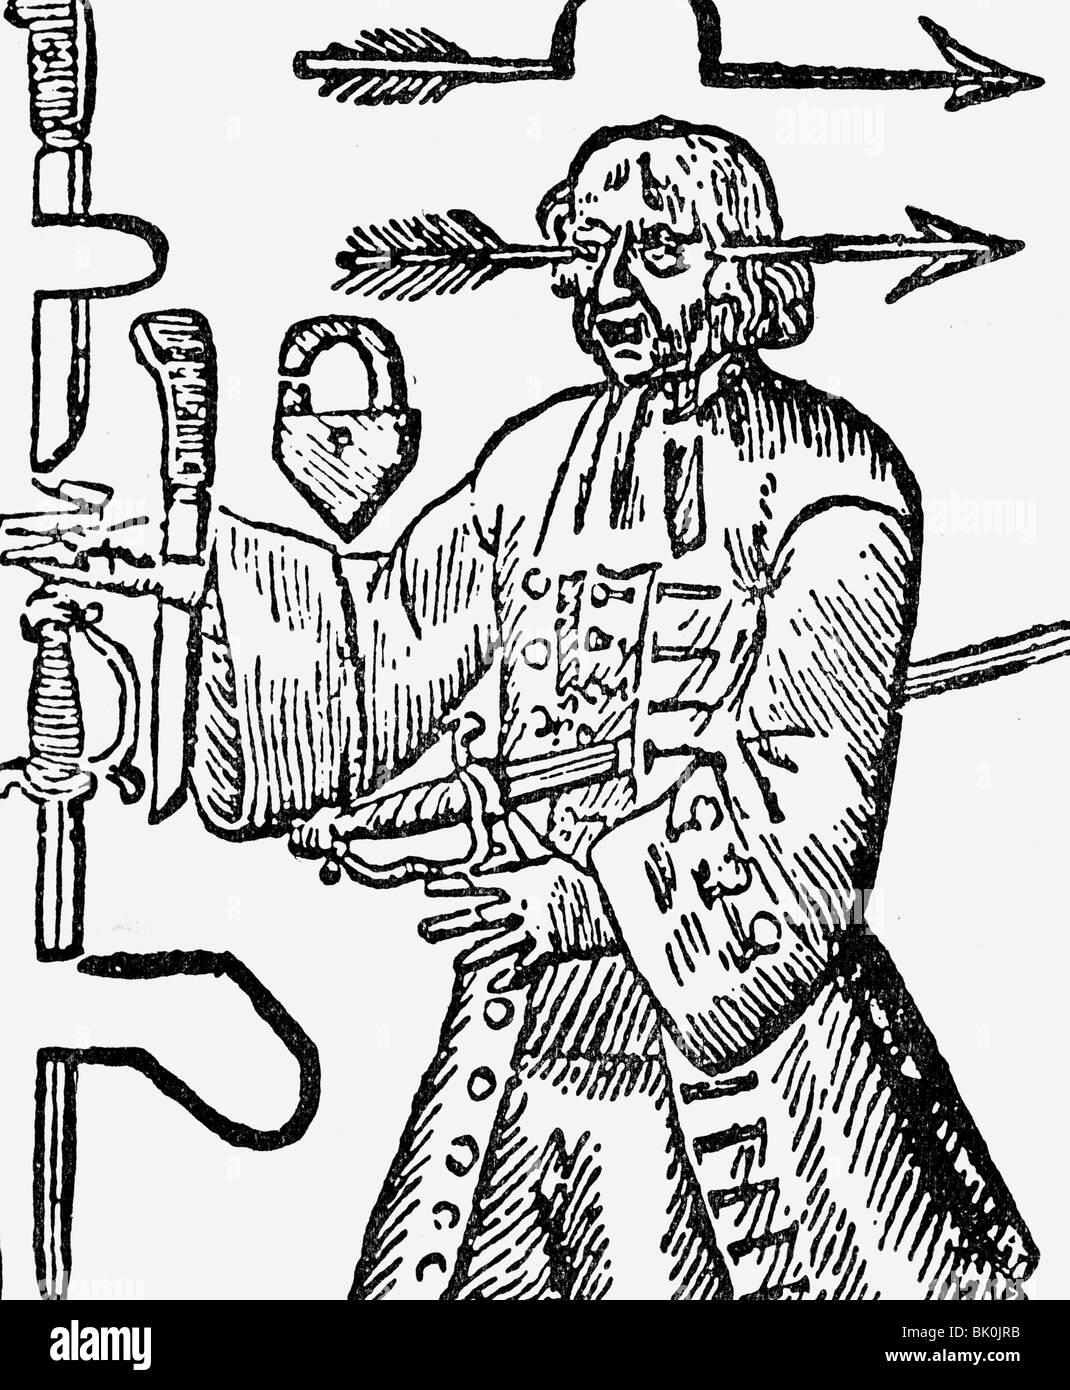 The magic coloring book trick - Circus Showmen Illusionist Magic Trick Of Penetration Copper Engraving 18th Century